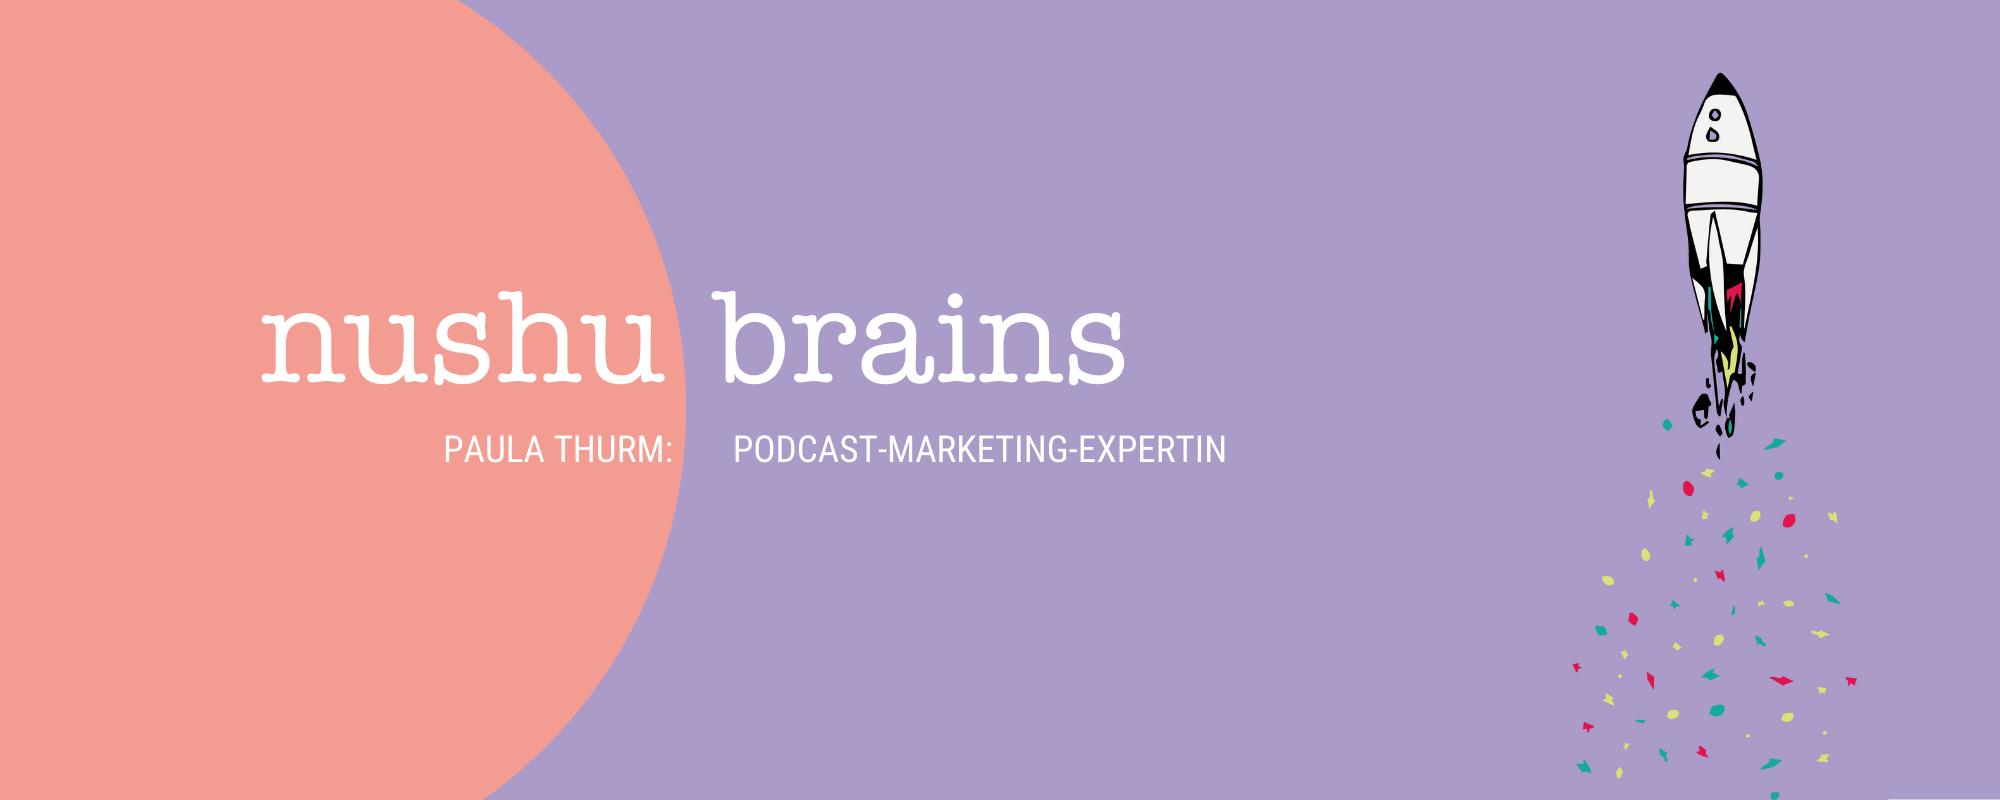 nushu brains: Paula Thurm, Podcast-Marketing-Expertin